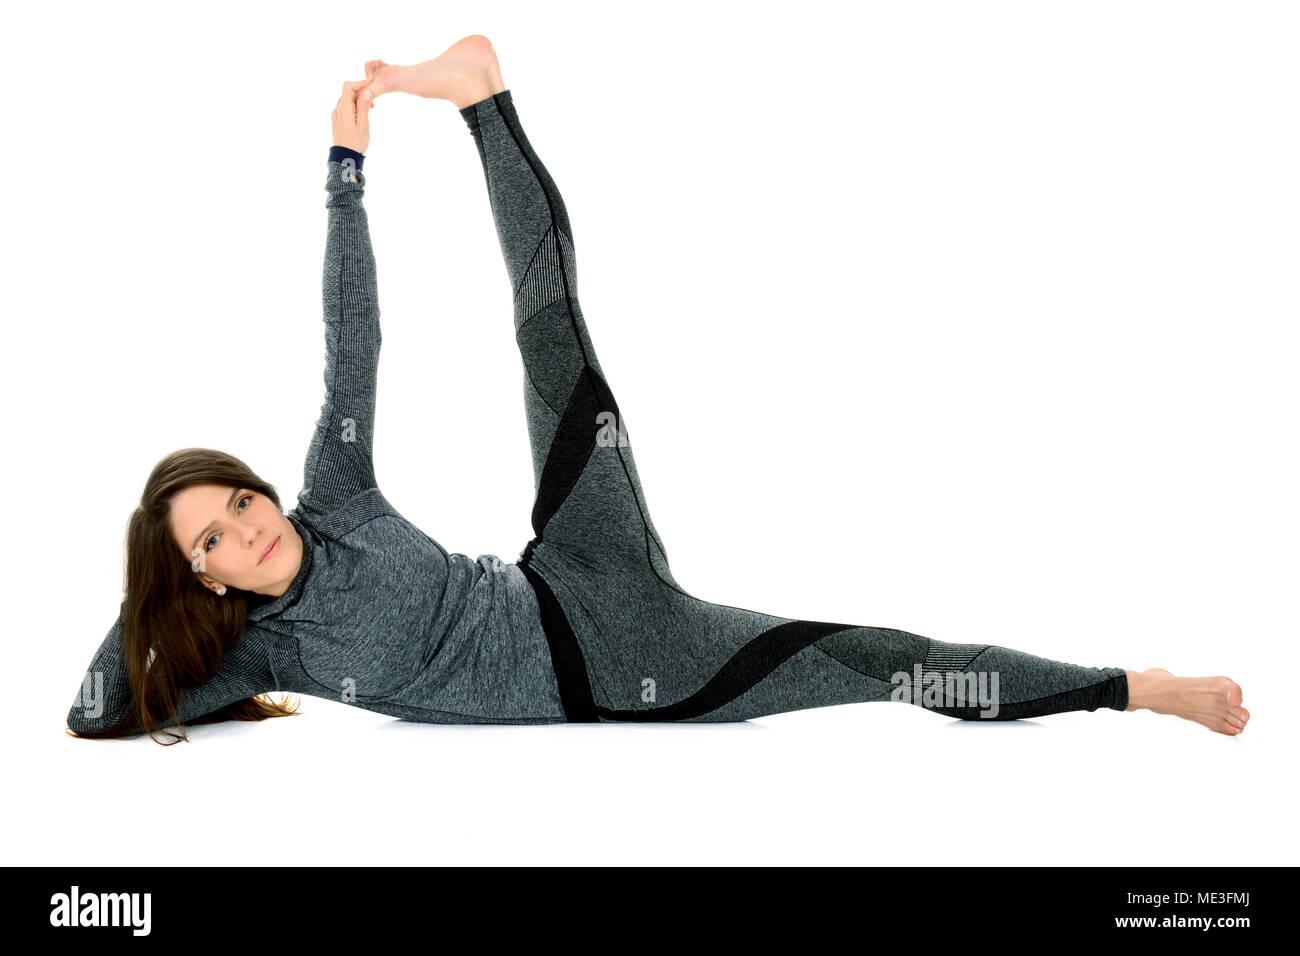 young woman doing yoga asana Anantasana Side-Reclining Leg Lift - Stock Image